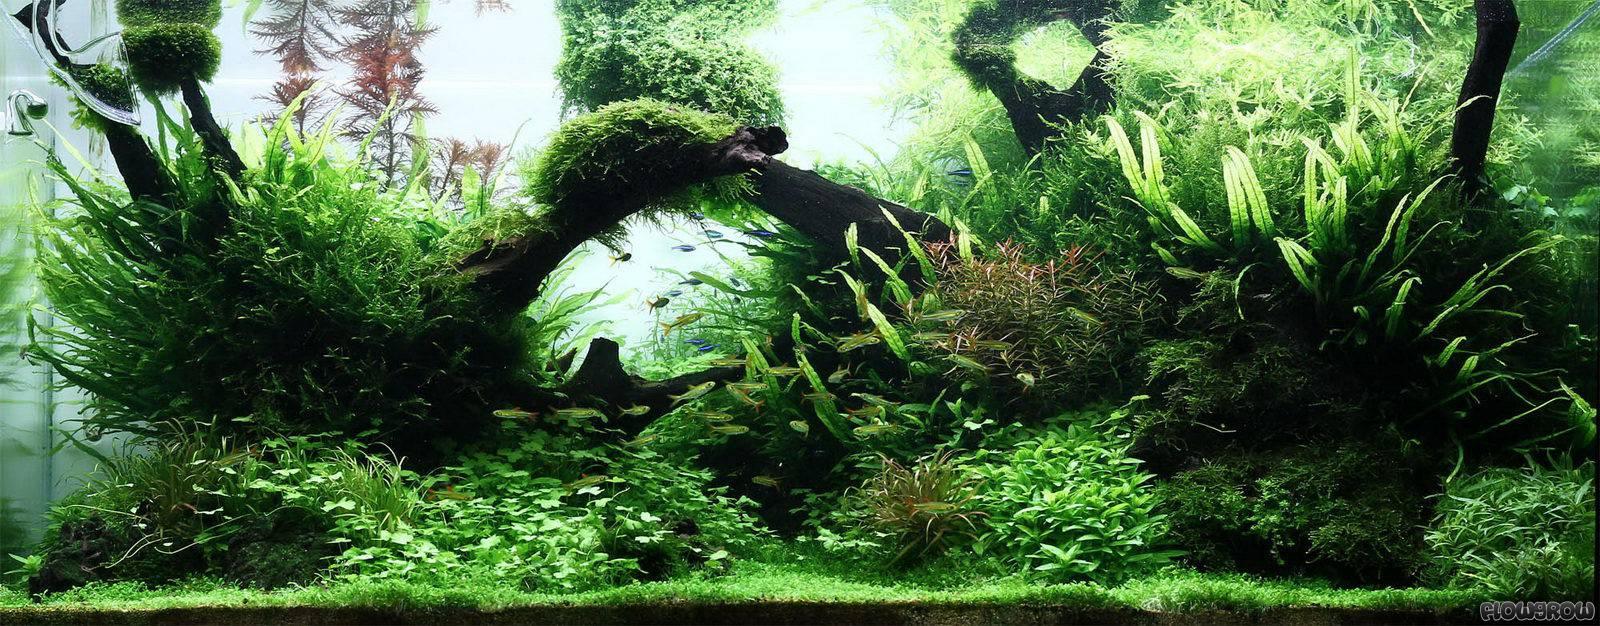 treibholz pflanzen flowgrow aquascape aquarien datenbank. Black Bedroom Furniture Sets. Home Design Ideas